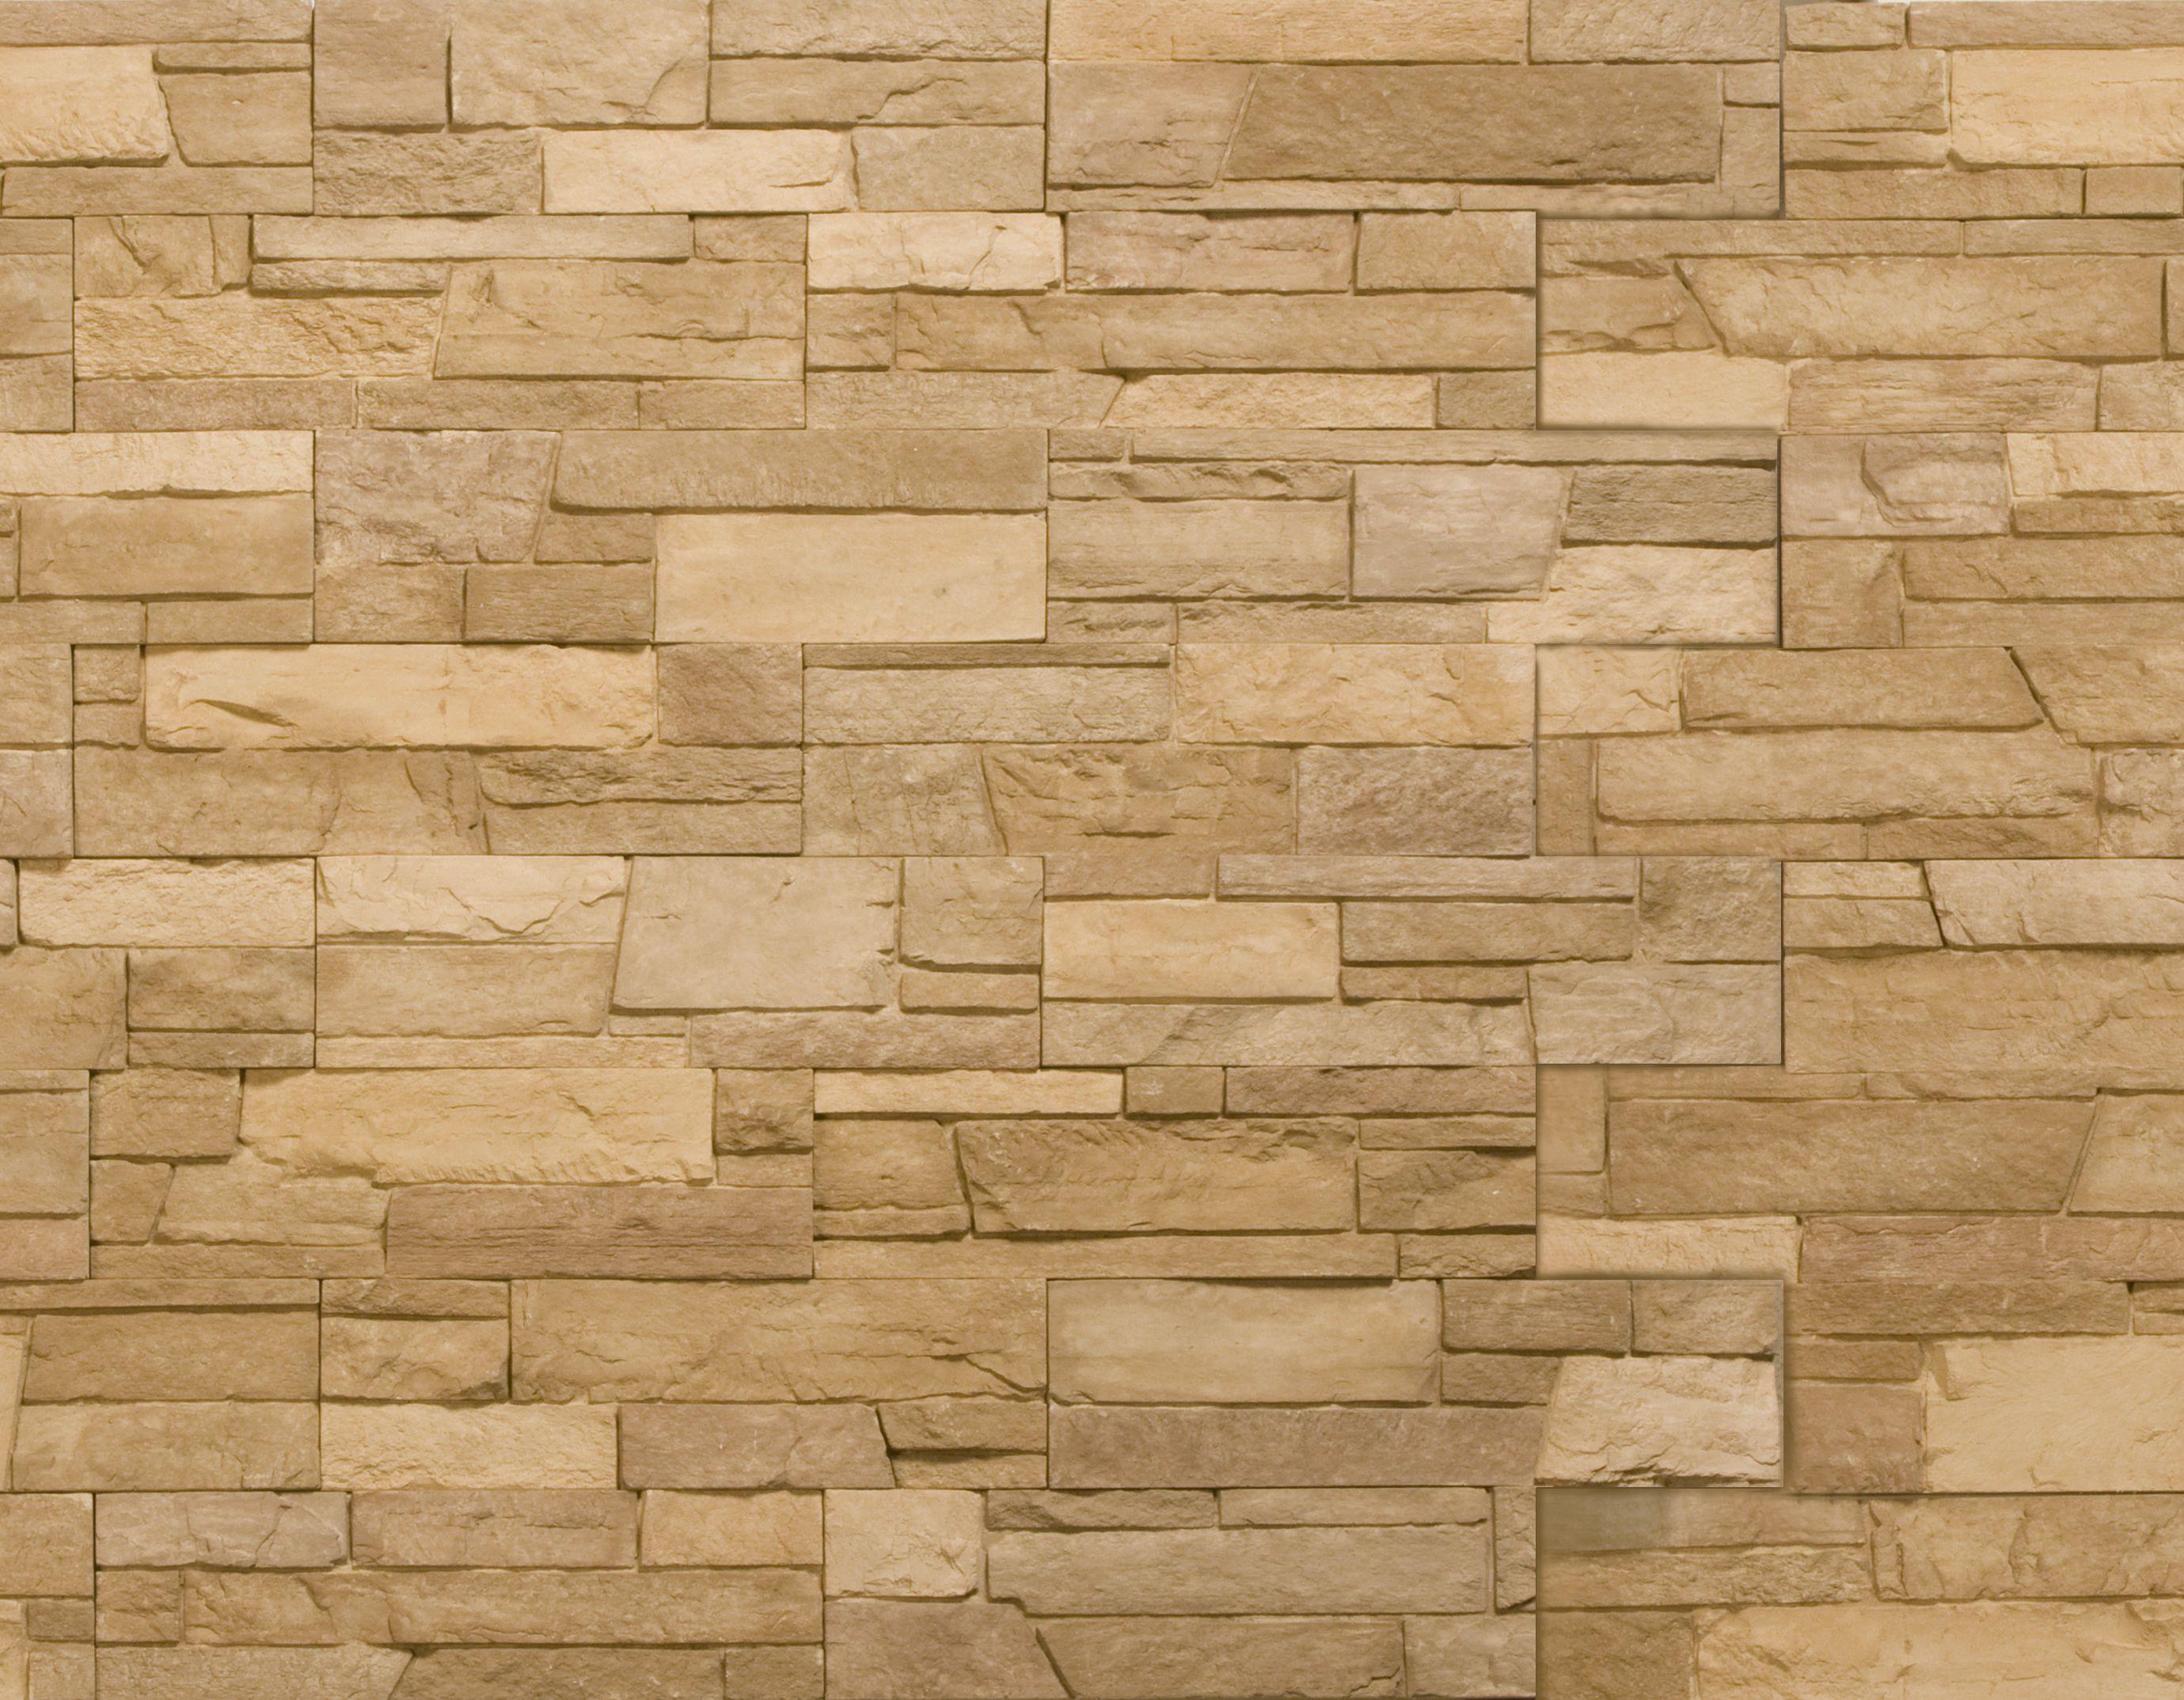 Stone Porches Block Wall Travertine Texture Patterns Textured Walls